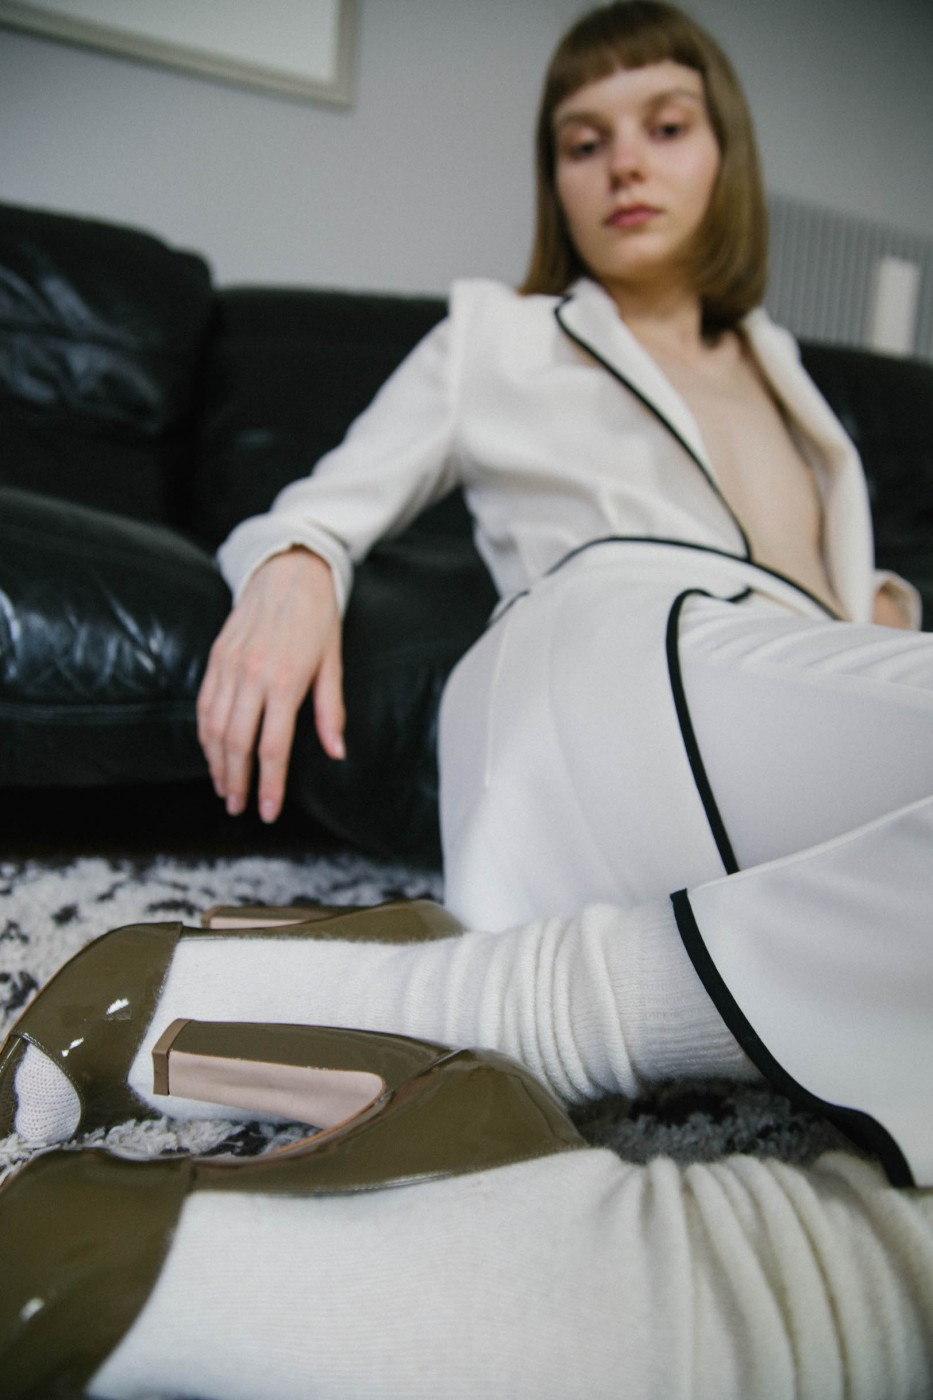 chaussettes-pas-chasse